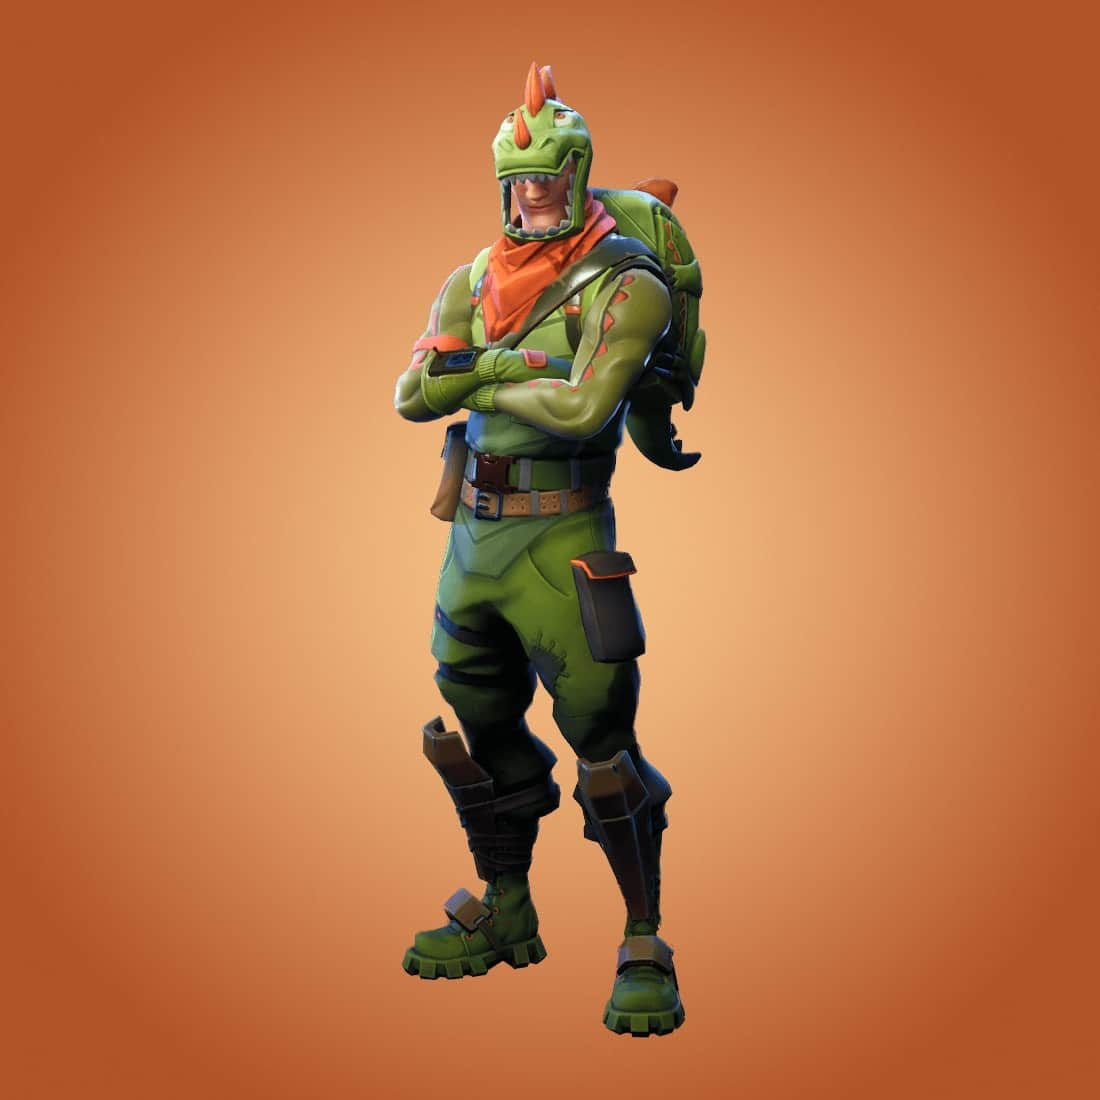 All Fortnite Characters & Skins June 2020 - Tech Centurion